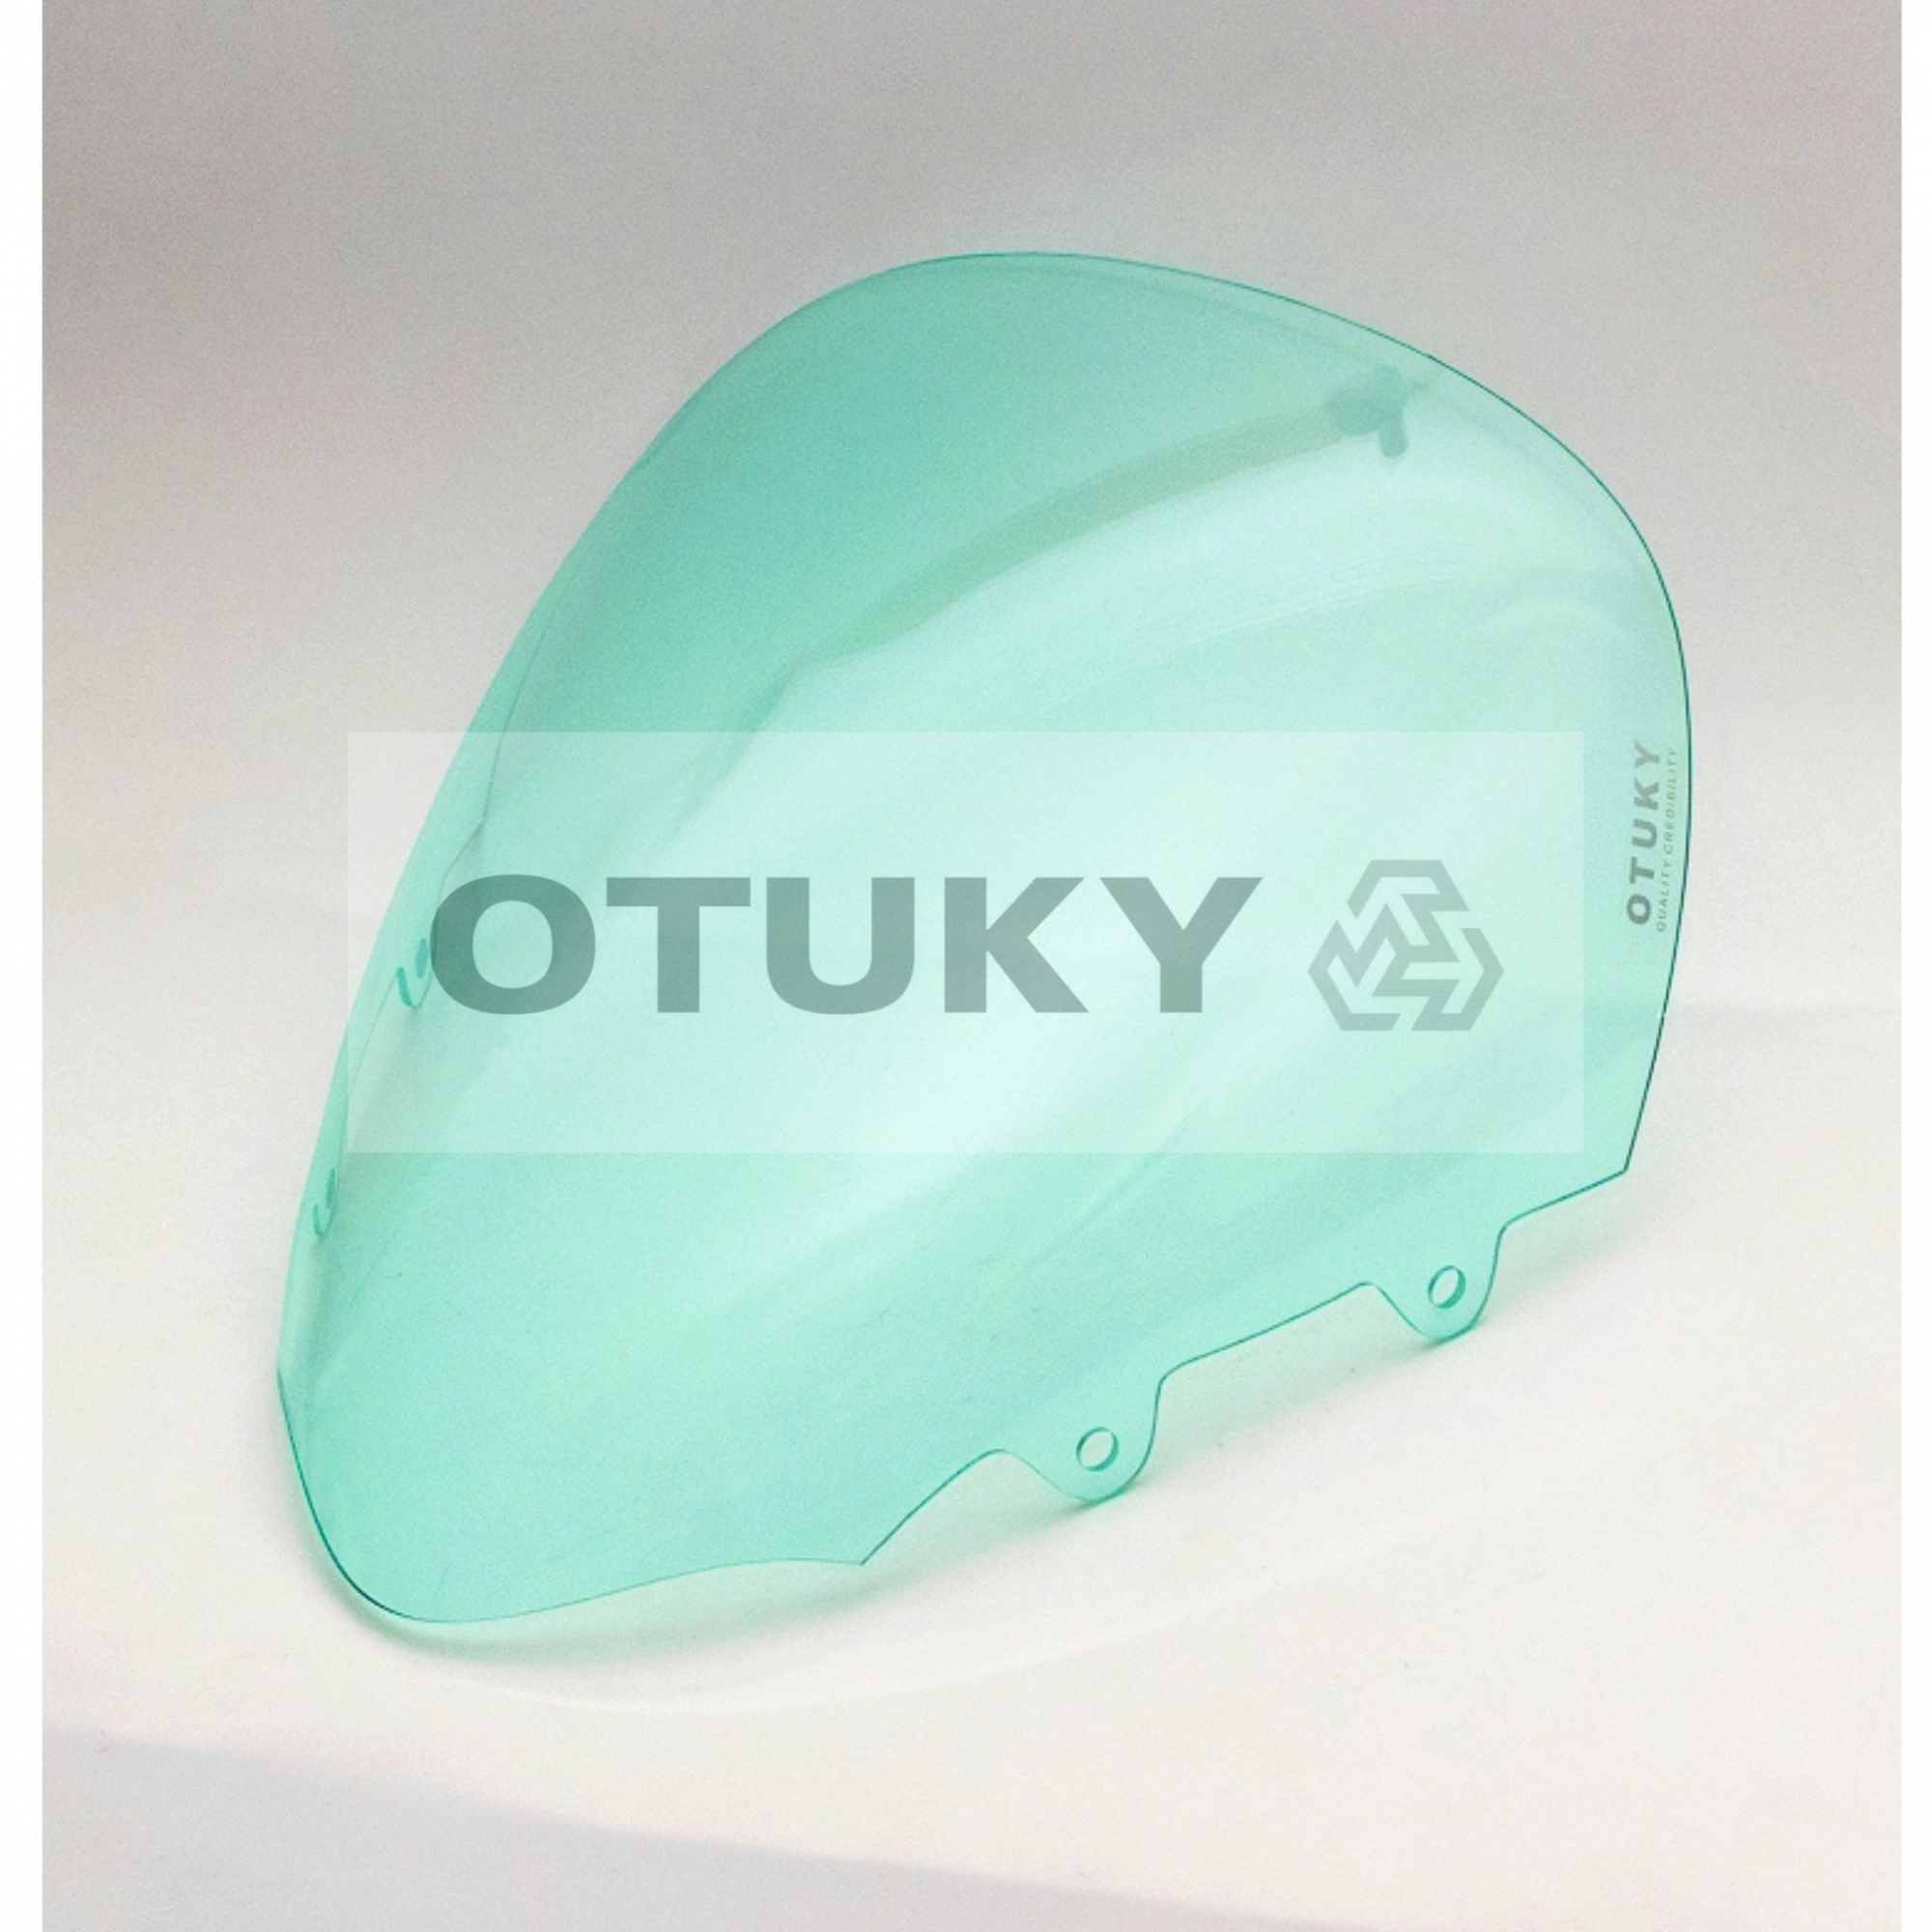 Bolha para Moto PCX 125 E 150 2013 2014 2015 2016 2017 2018 Otuky Padrão